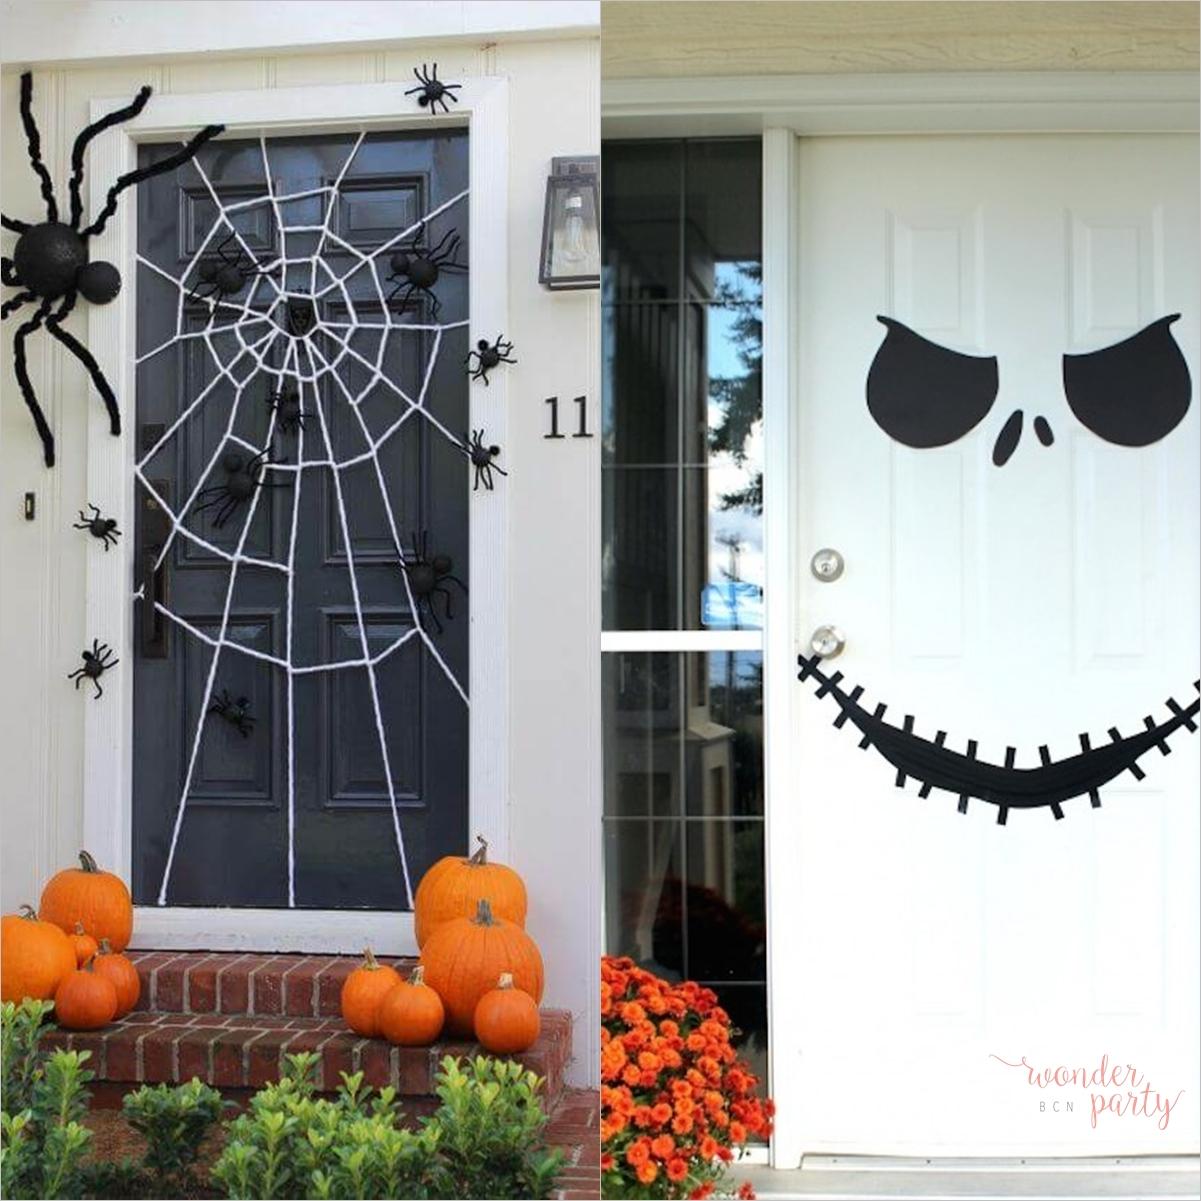 5 Ideas Para Halloween 6 Wonder Party Bcn Wonderparty Bcn - Ideas-halloween